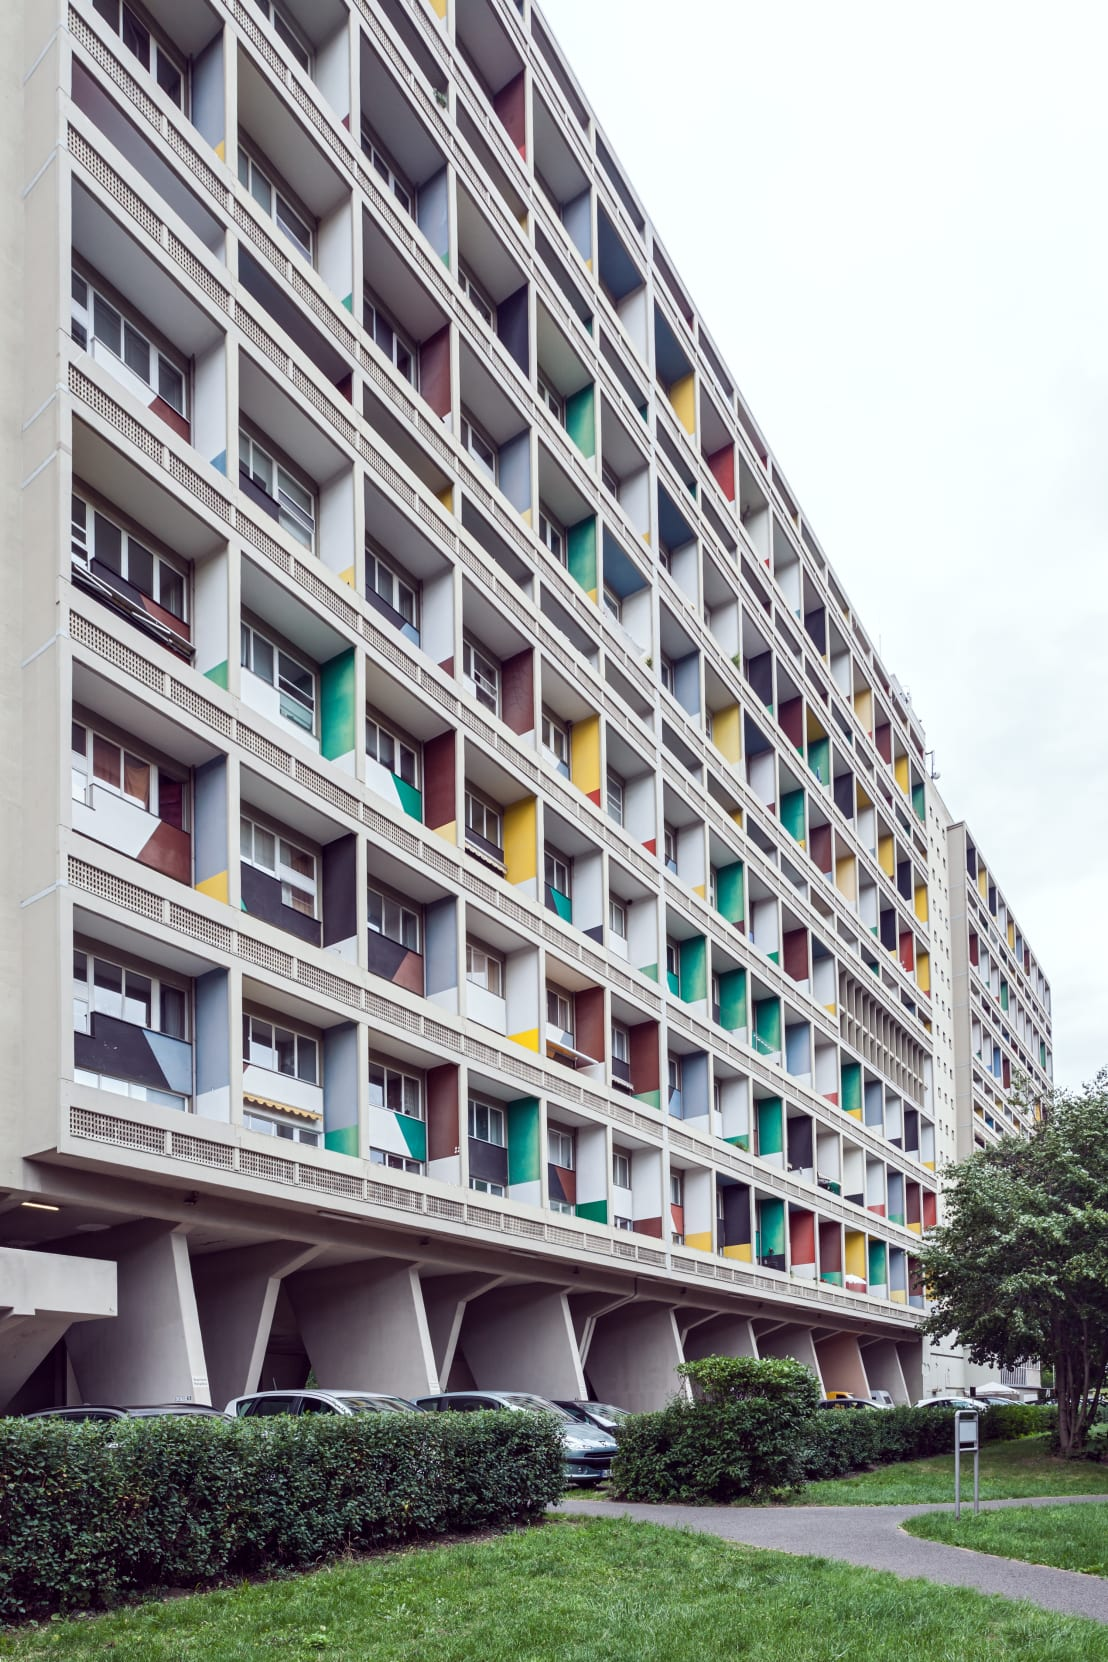 appartement im corbusierhaus berlin von albrecht jung gmbh co kg homify. Black Bedroom Furniture Sets. Home Design Ideas